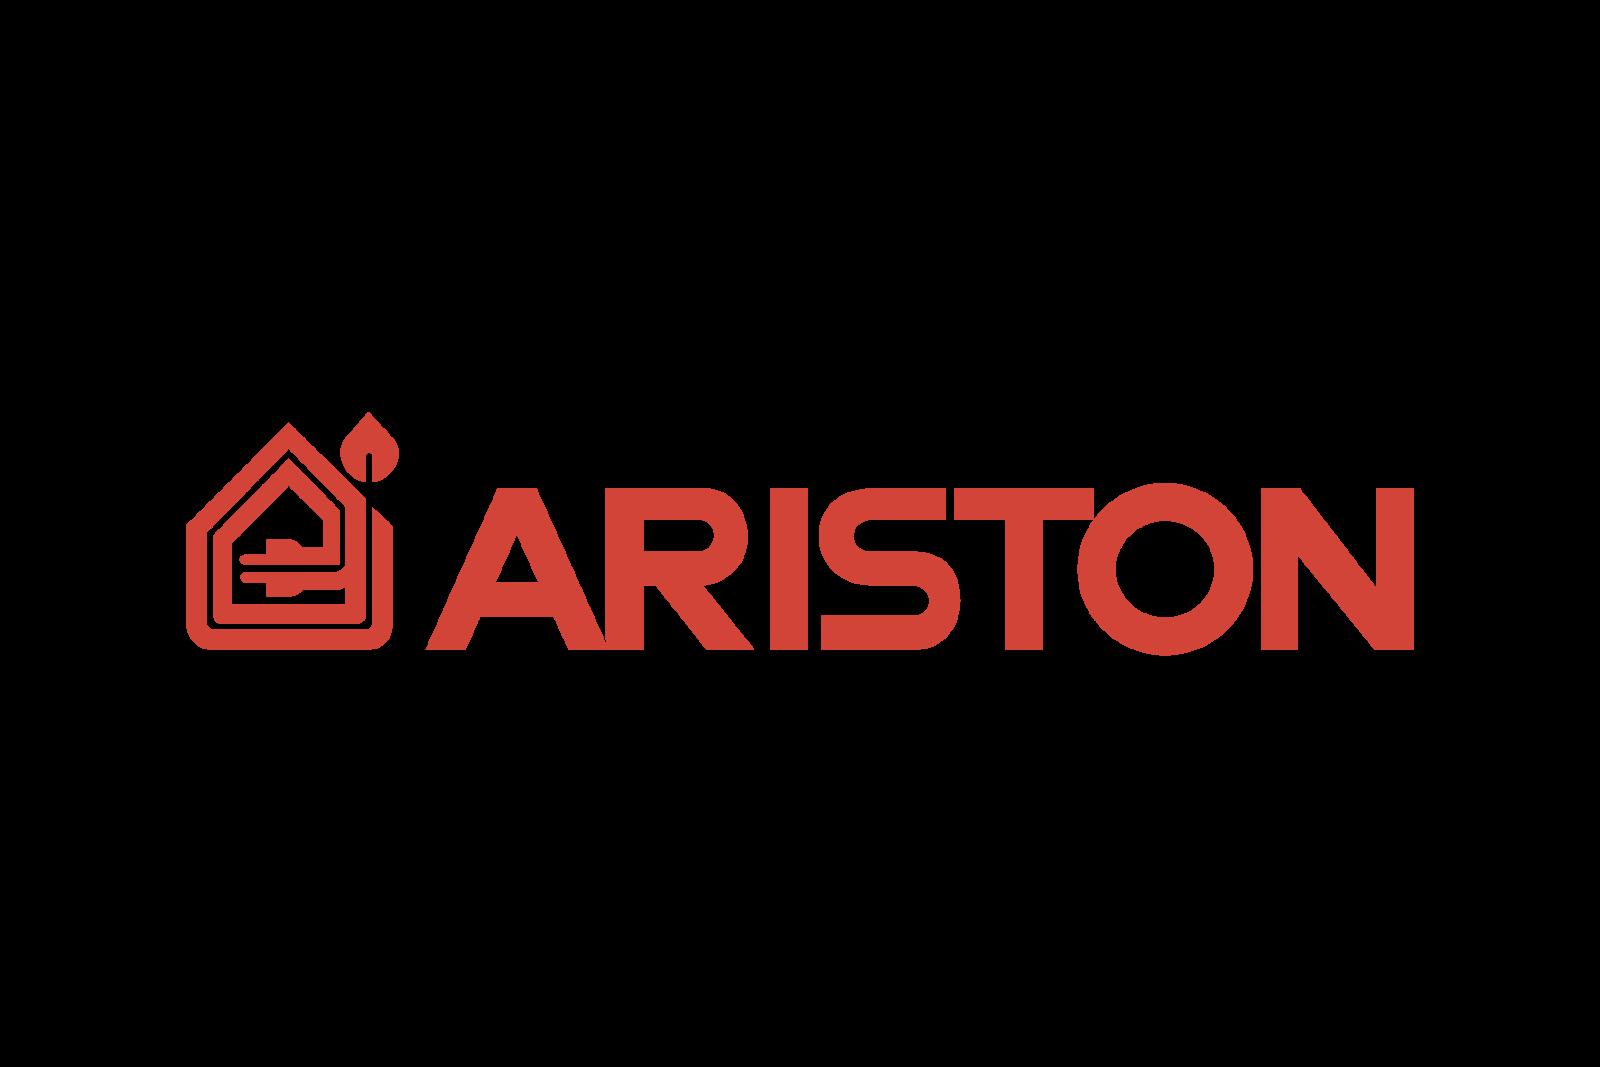 ariston logo. Black Bedroom Furniture Sets. Home Design Ideas